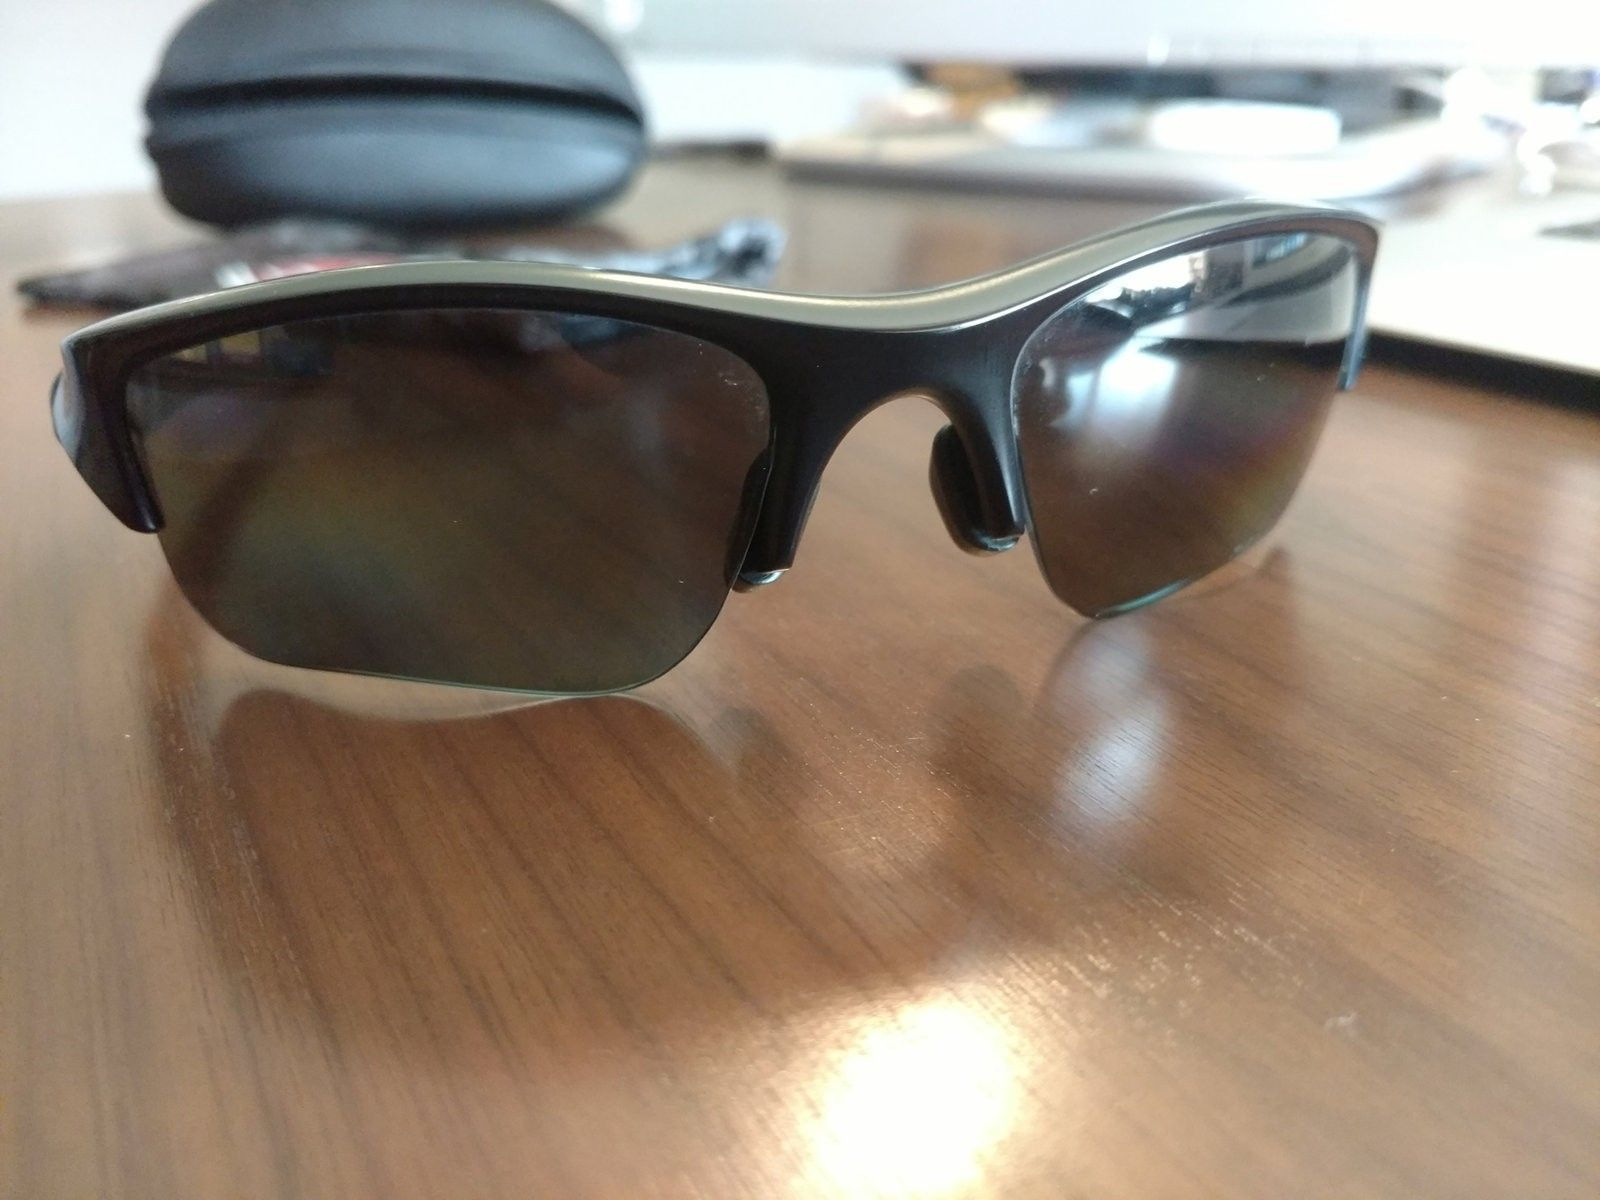 Matte Black Flak Jacket - 2016-07-27 16.05.23.jpg